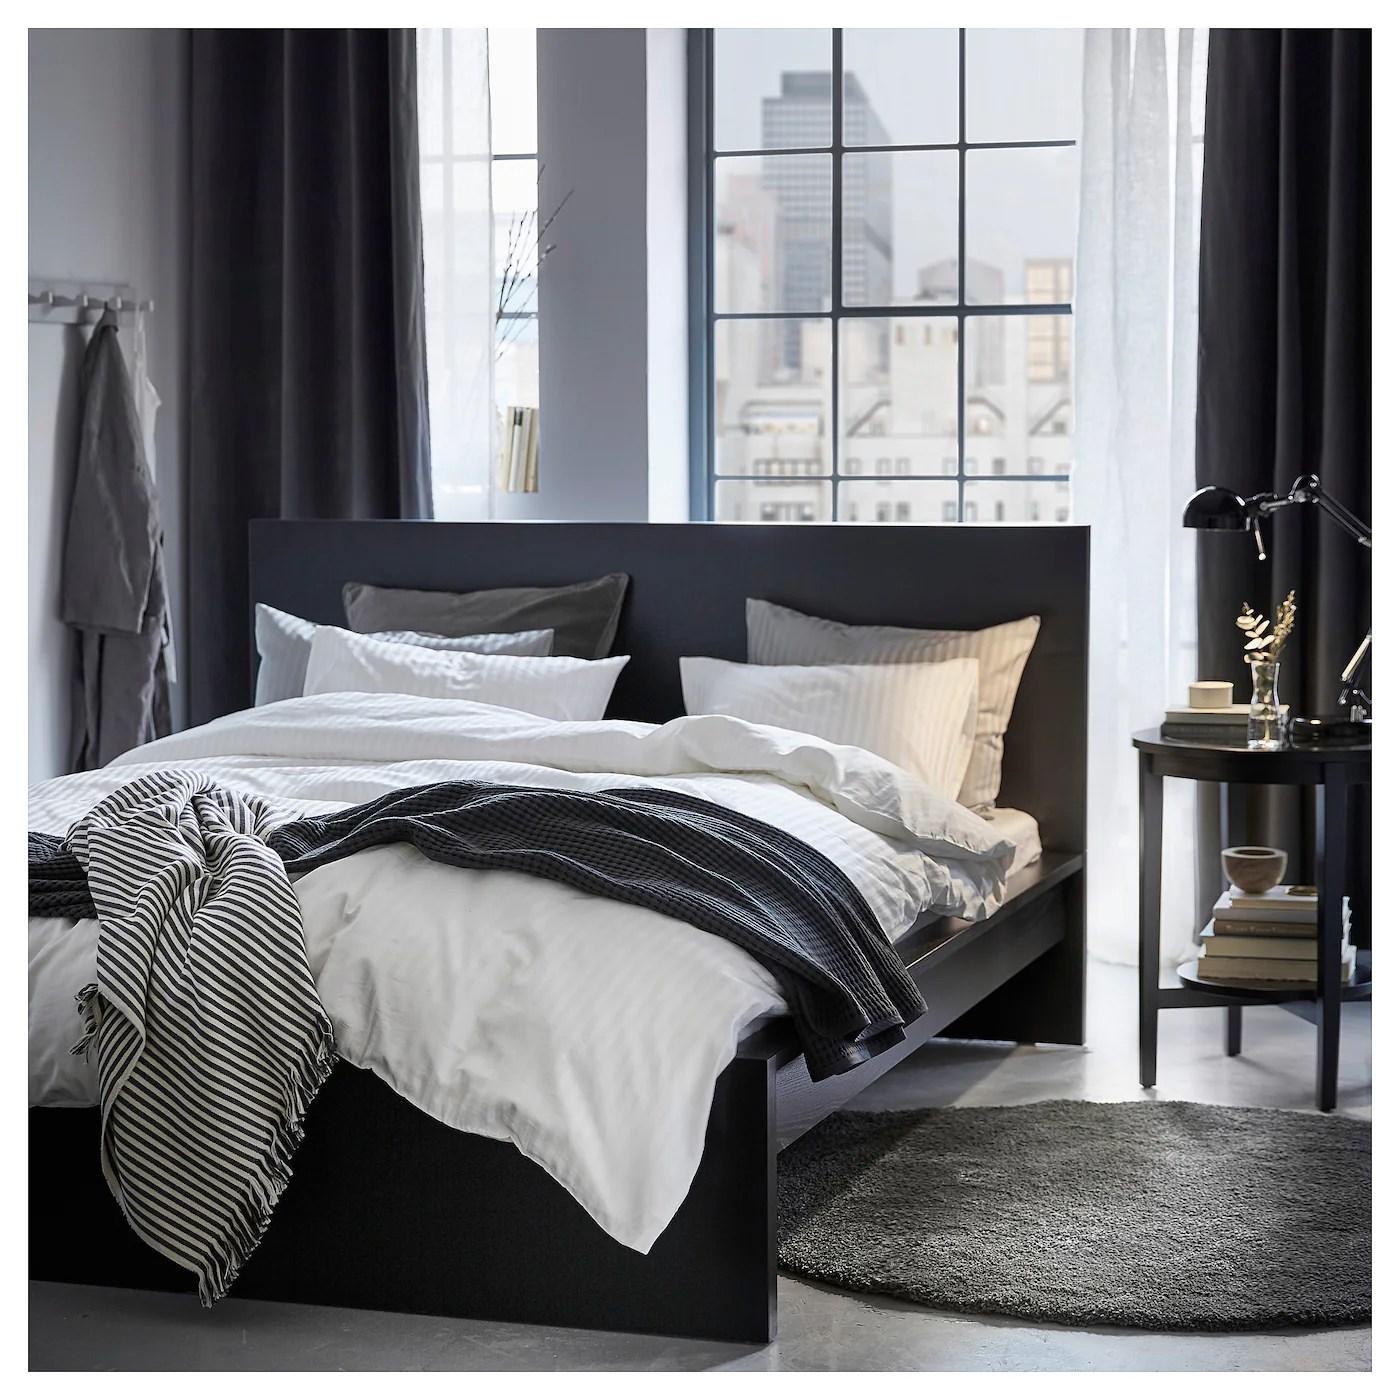 Nattjasmin Housse Couette 2 Taies Blanc 260x240 65x65 Cm Ikea